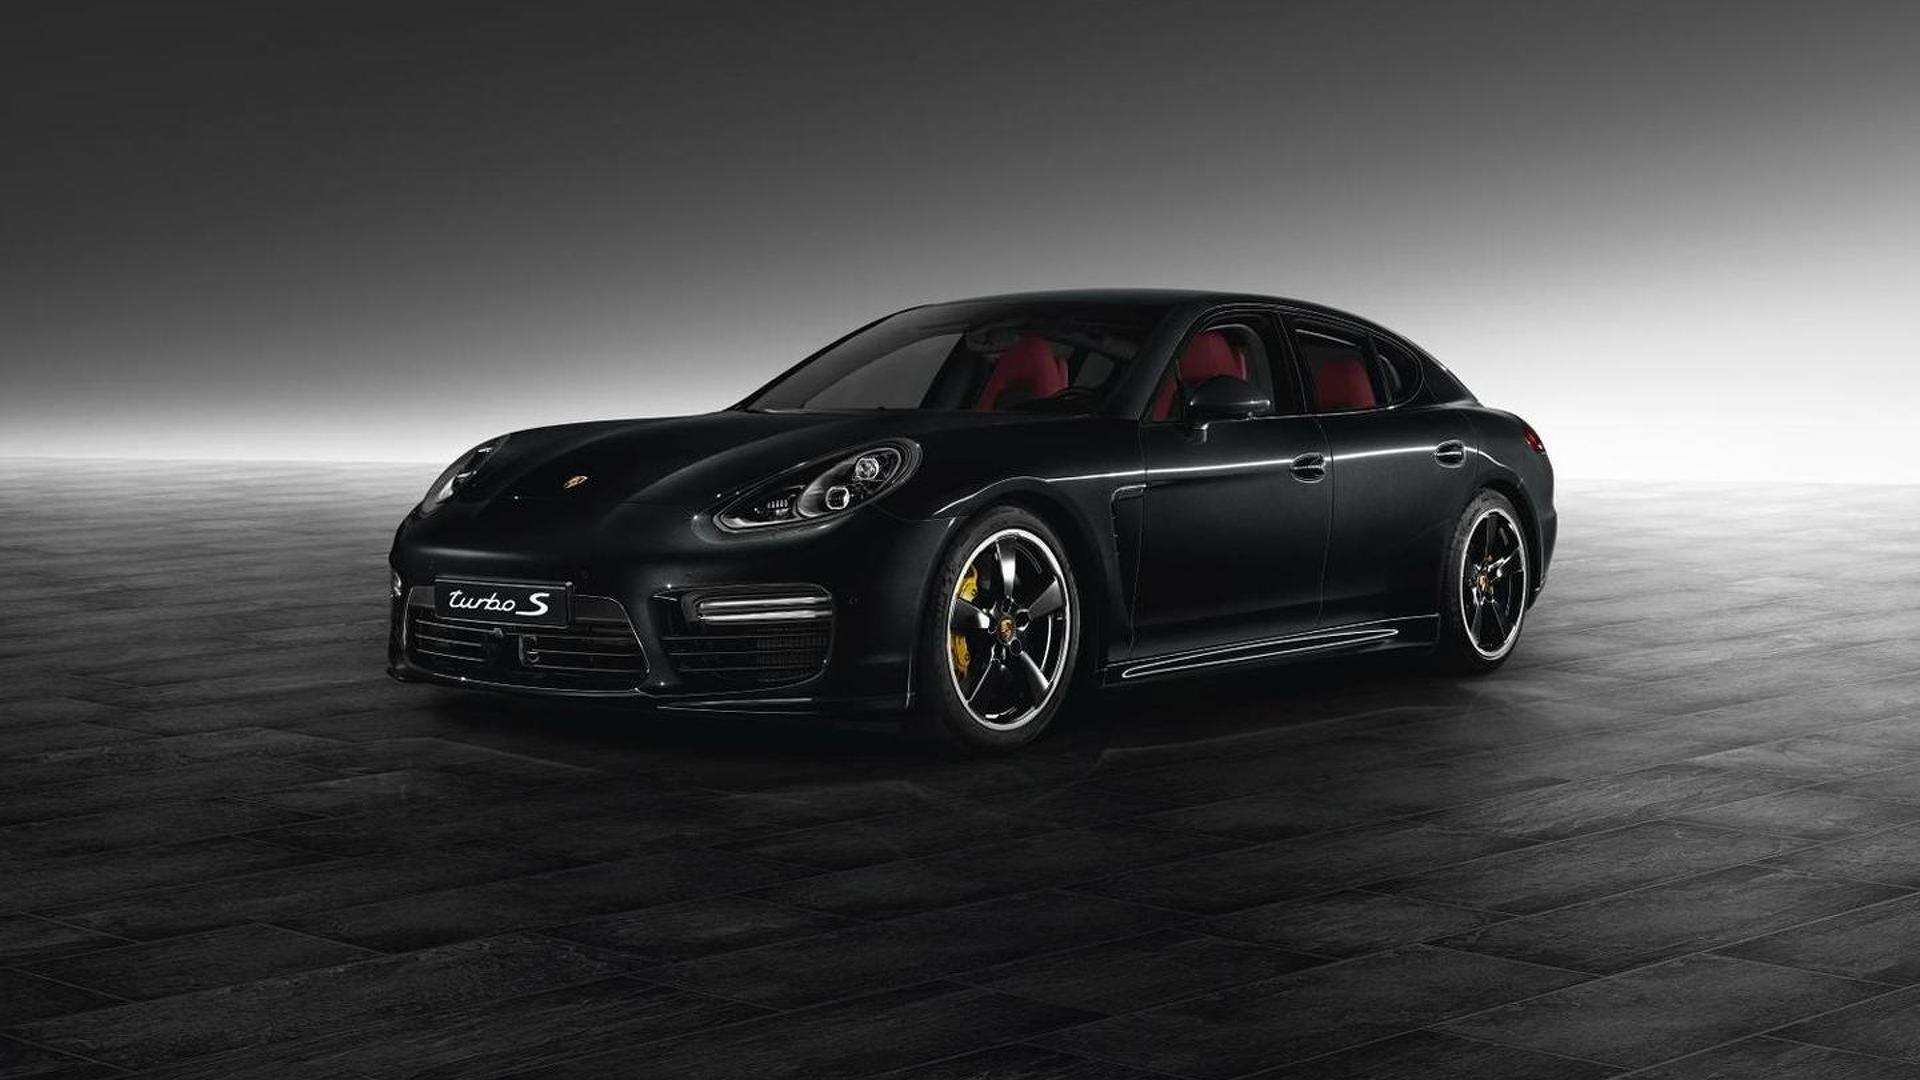 Porsche Exclusive dresses up a Panamera Turbo S in Jet Black Metallic